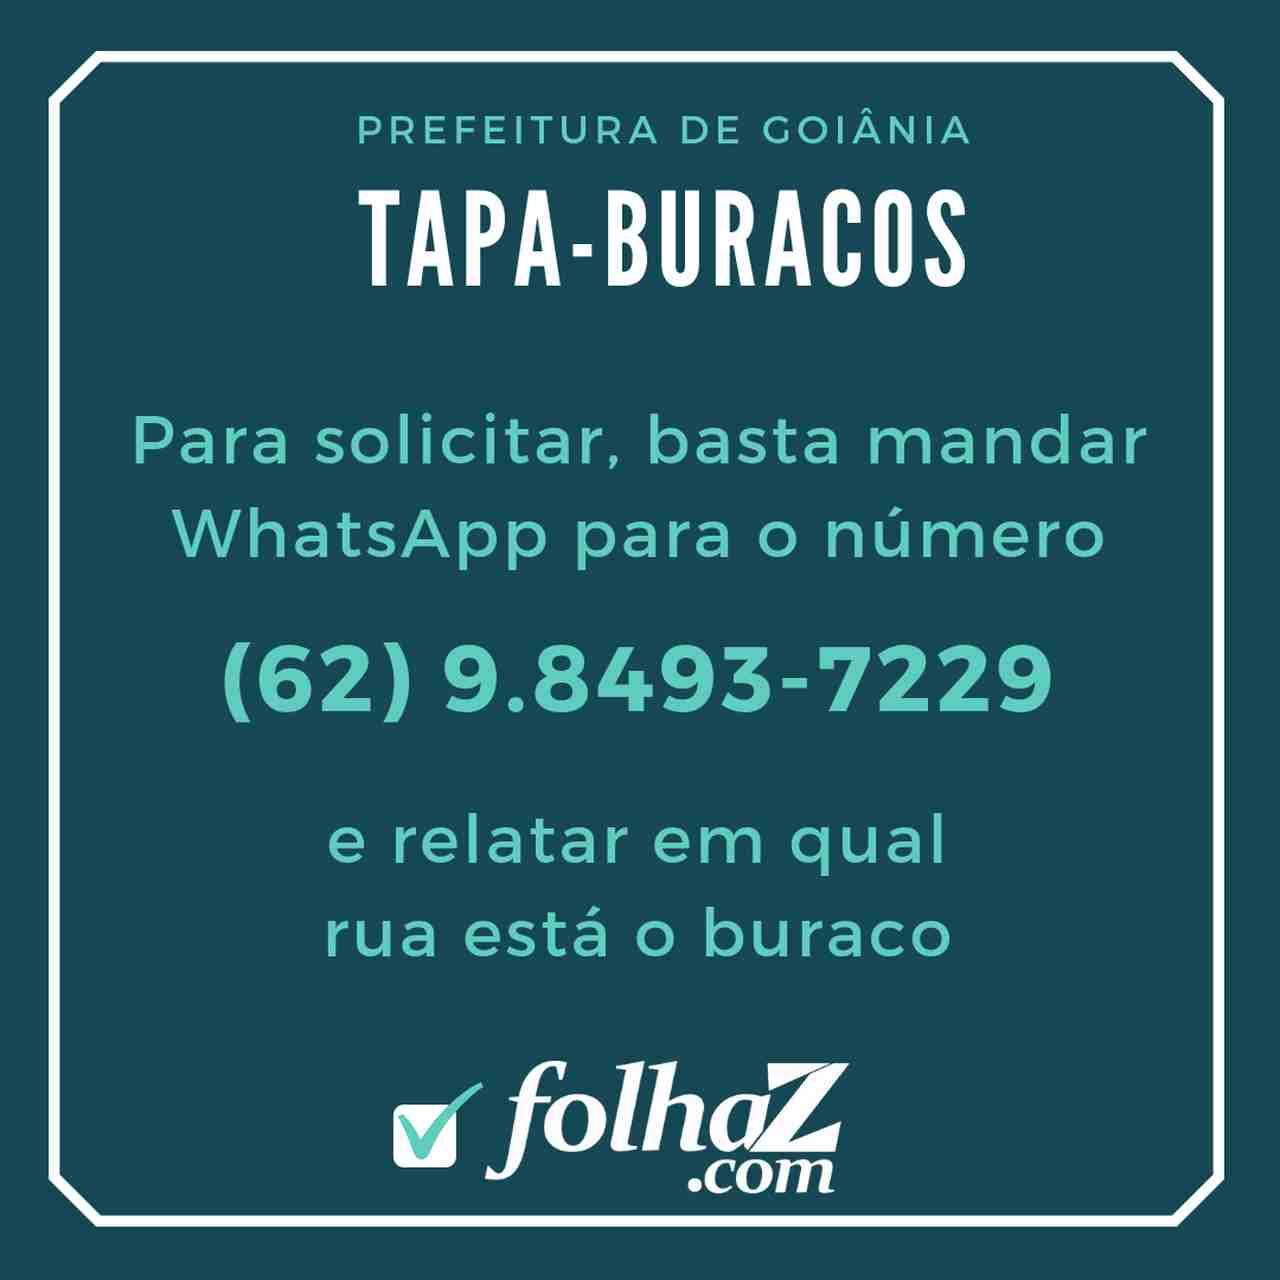 WhatsApp do Tapa-Buracos em Goiânia